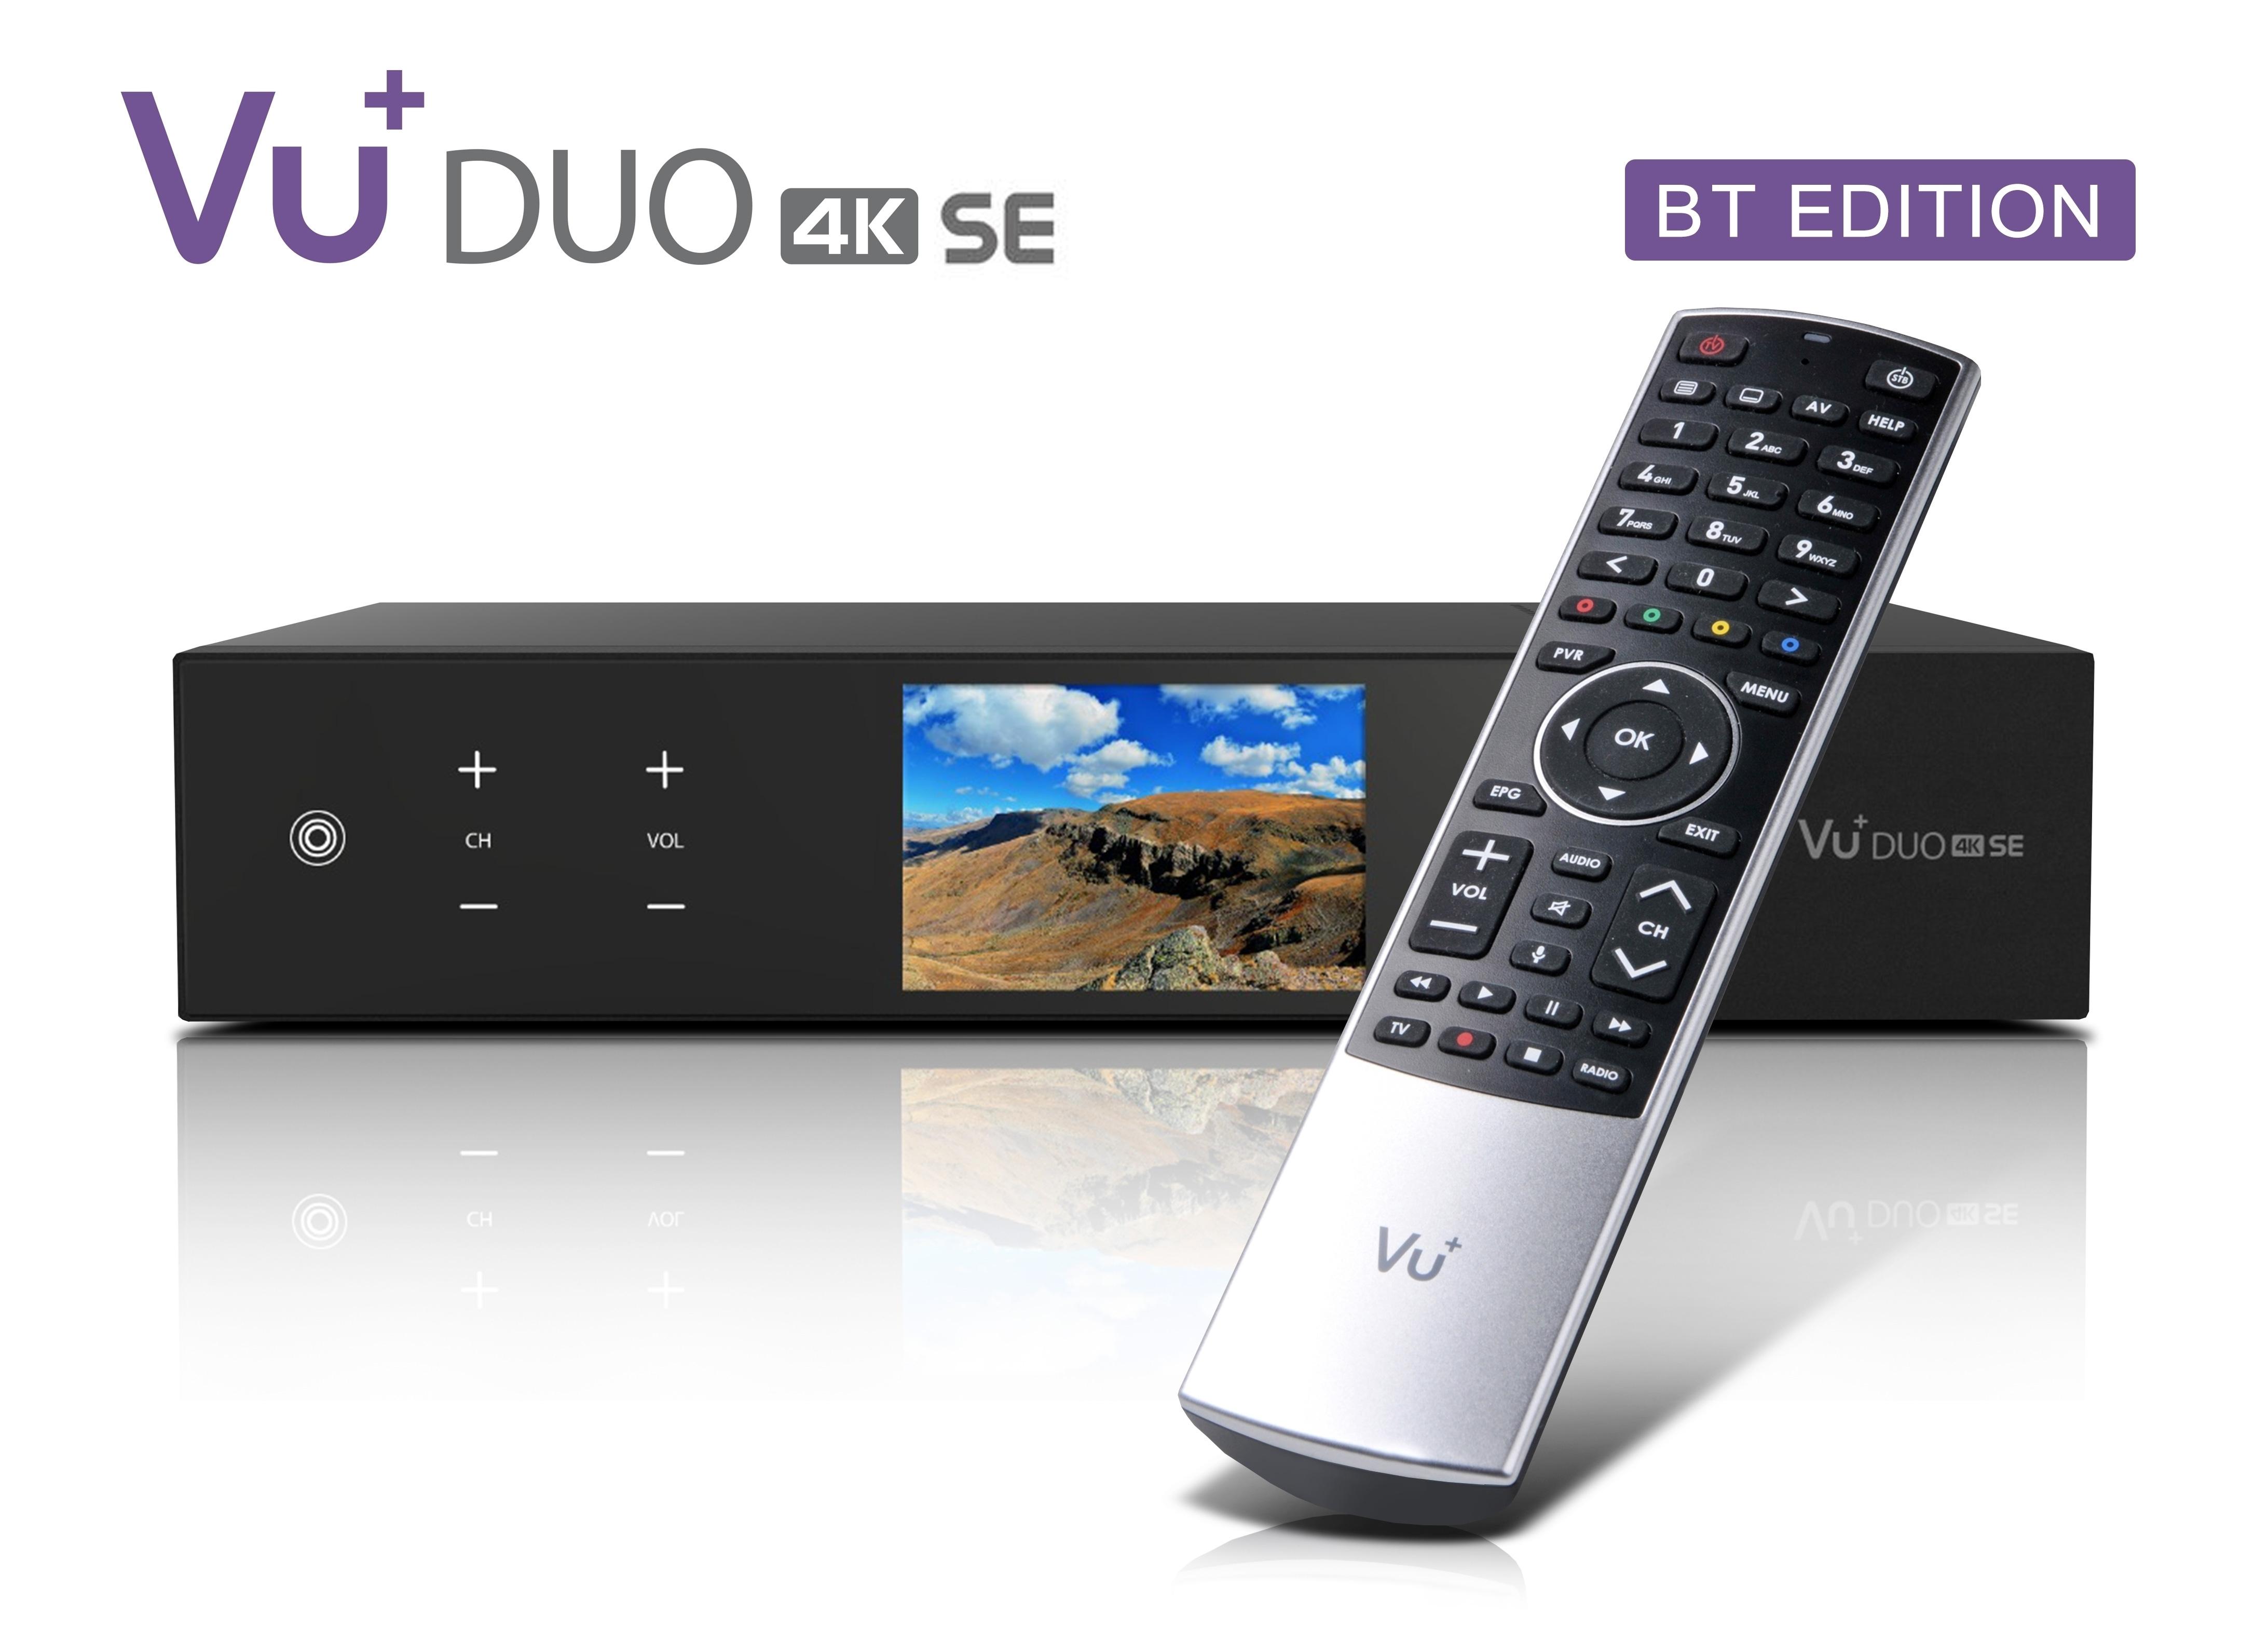 VU+ Duo 4K SE BT 1x DVB-S2X FBC Twin / 1x DVB-C FBC Tuner 2 TB HDD Linux Receiver UHD 2160p